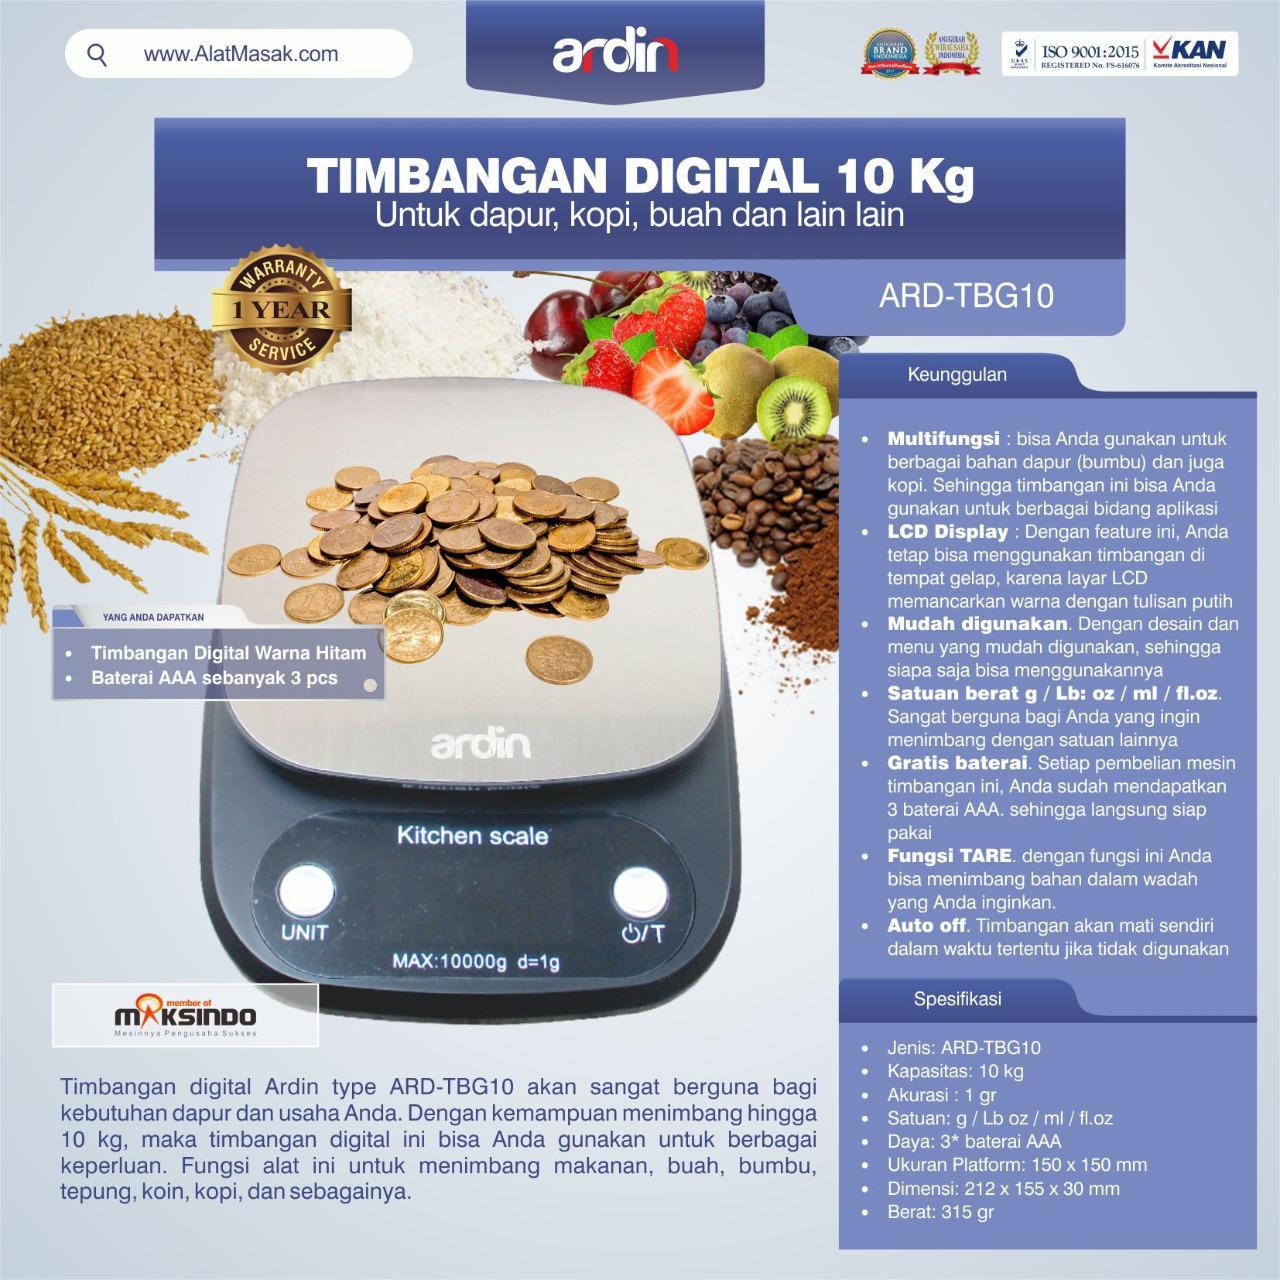 Jual Timbangan Digital 10 kg / Timbangan Kopi ARD-TBG10 di Yogyakarta